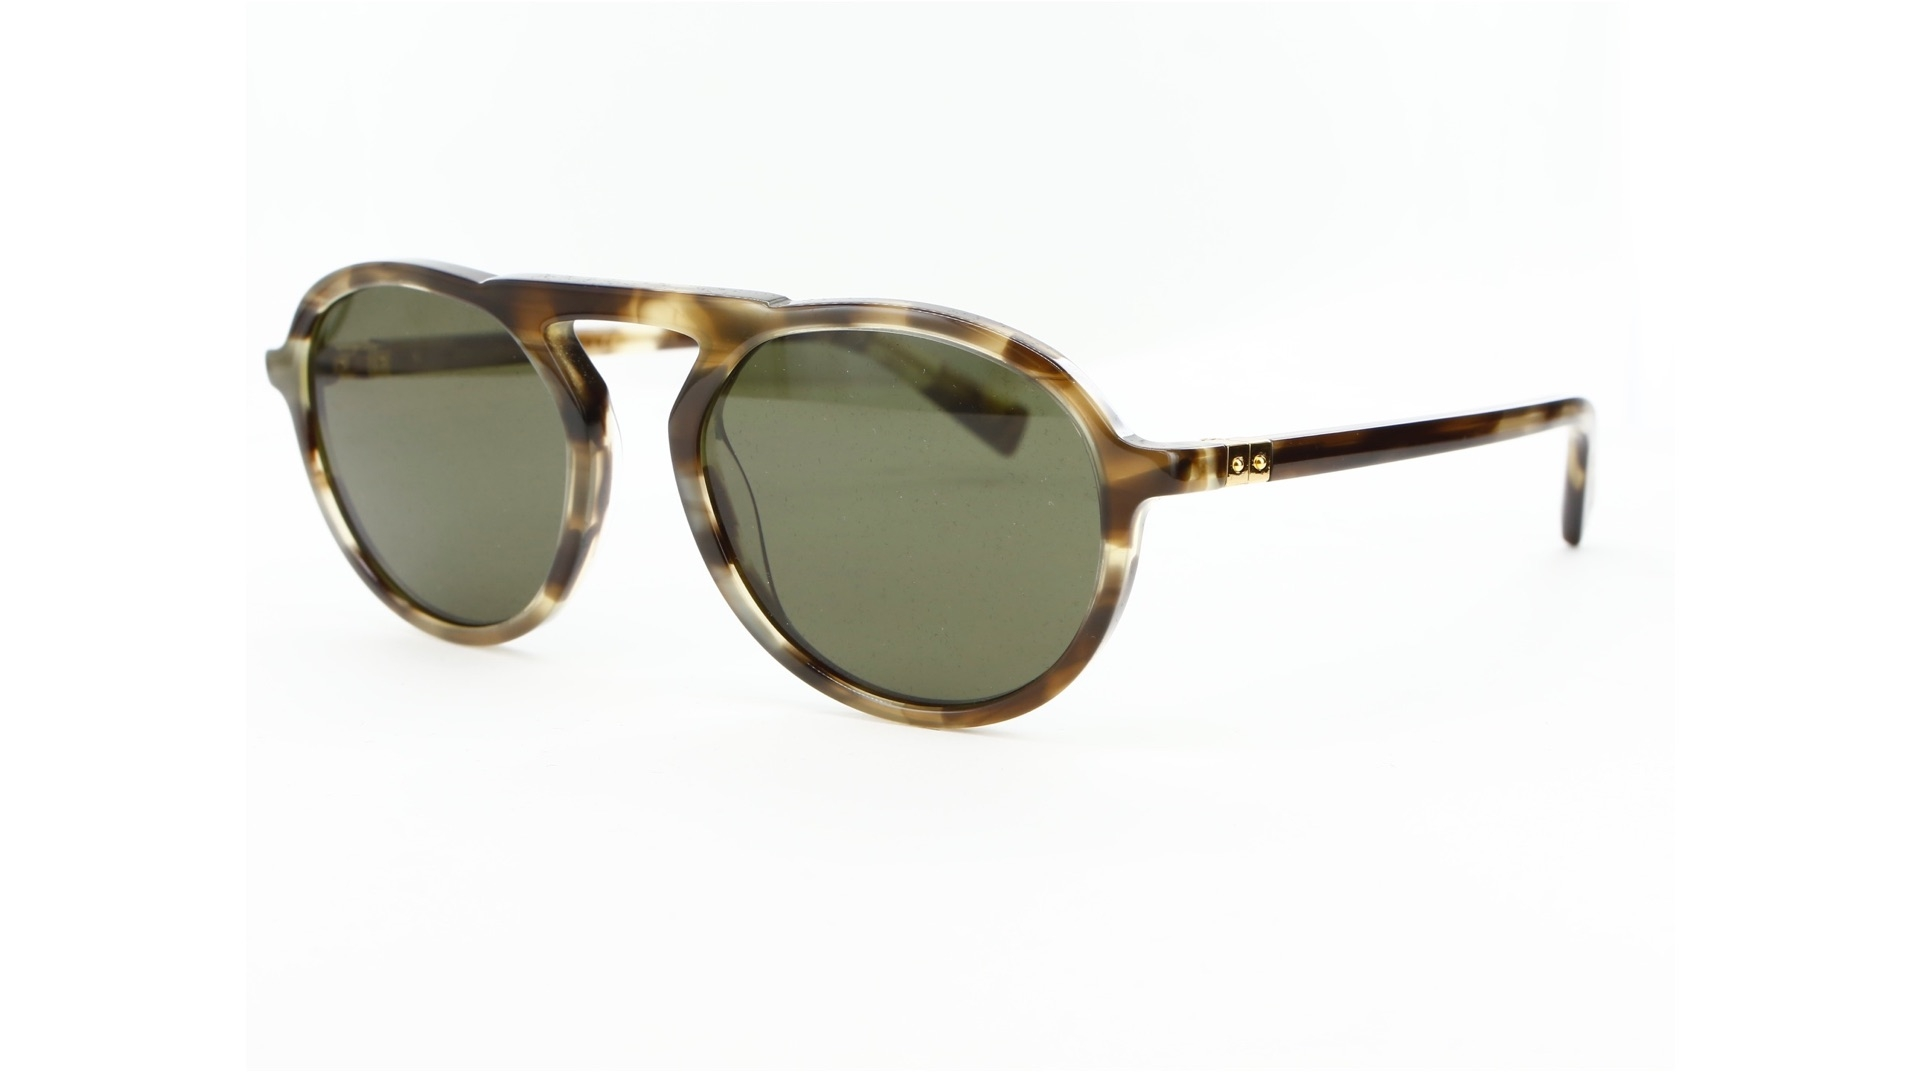 Dolce & Gabbana - ref: 81315